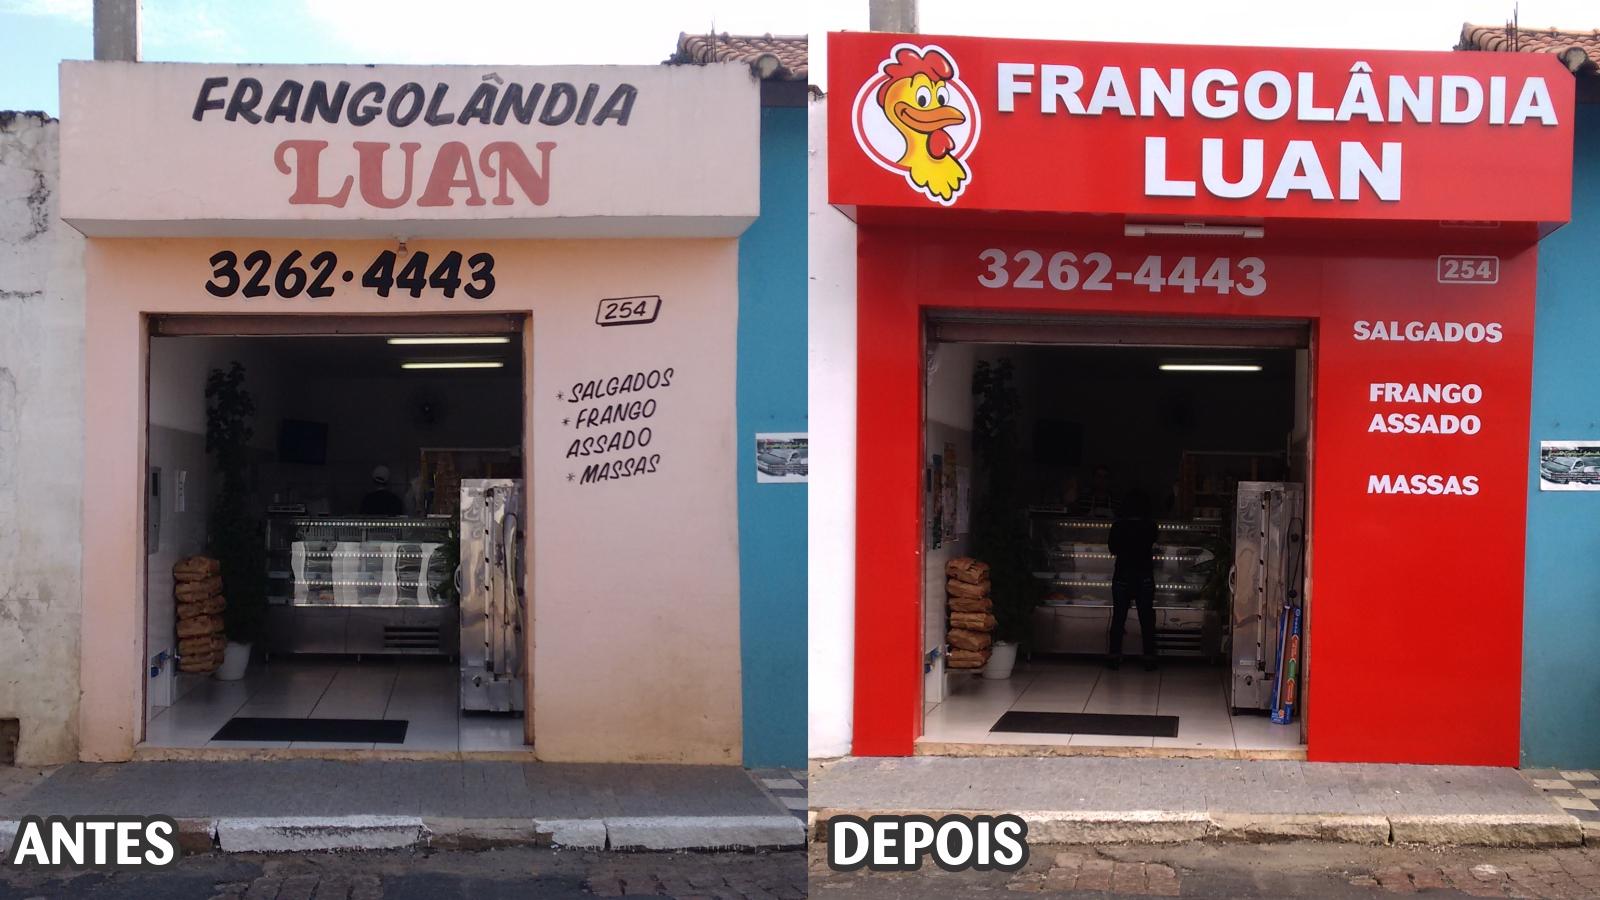 frangolândia_Luan.jpg